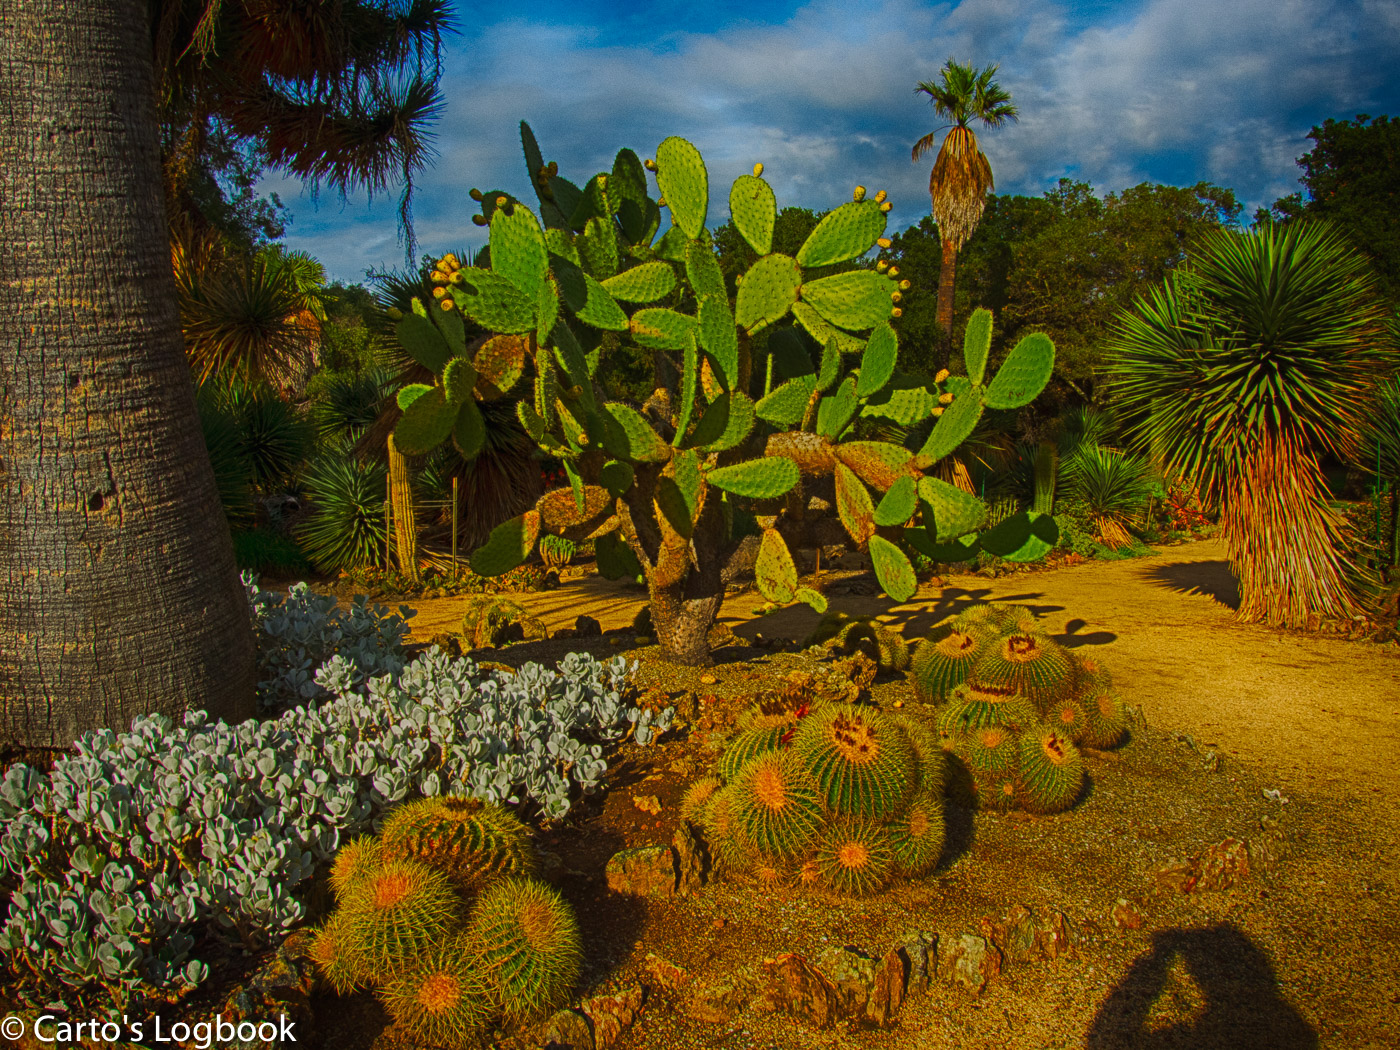 WPC Green 20141208 DSCN0880. Cactus In Bloom, Arizona Garden, Stanford ...